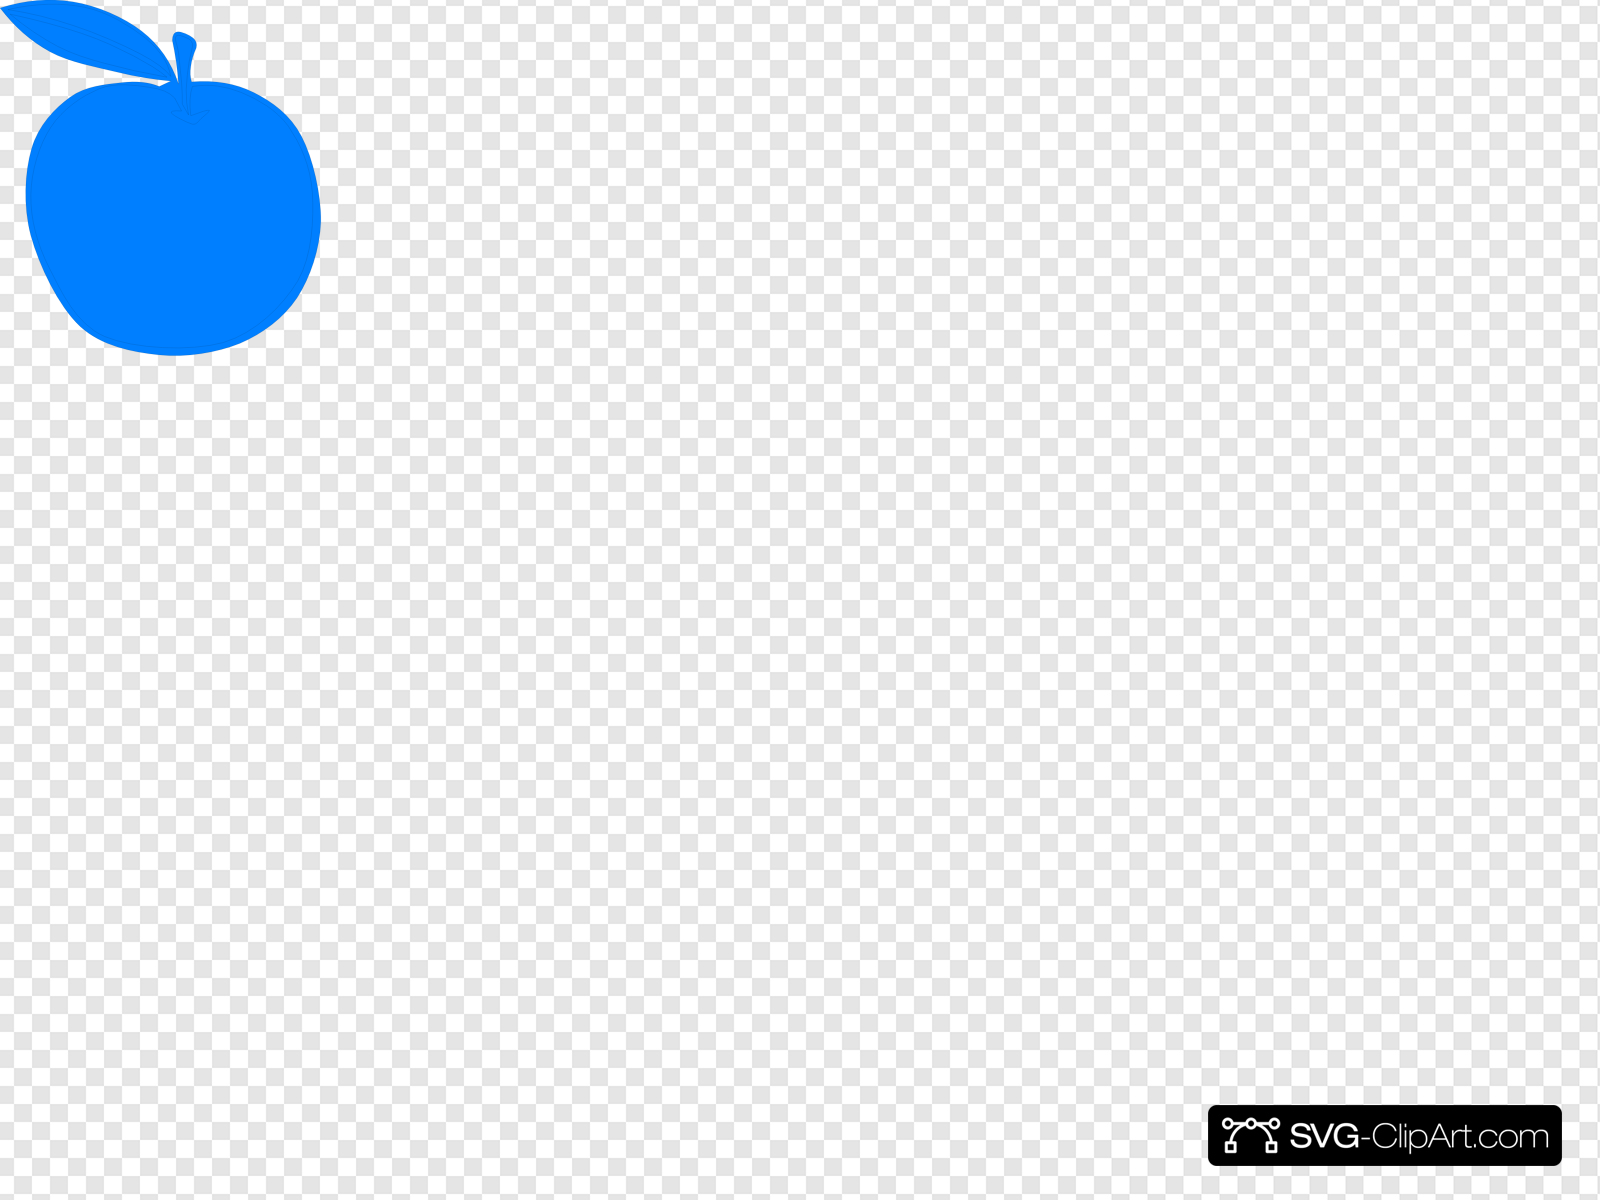 Mela Azzurra Clip art, Icon and SVG.